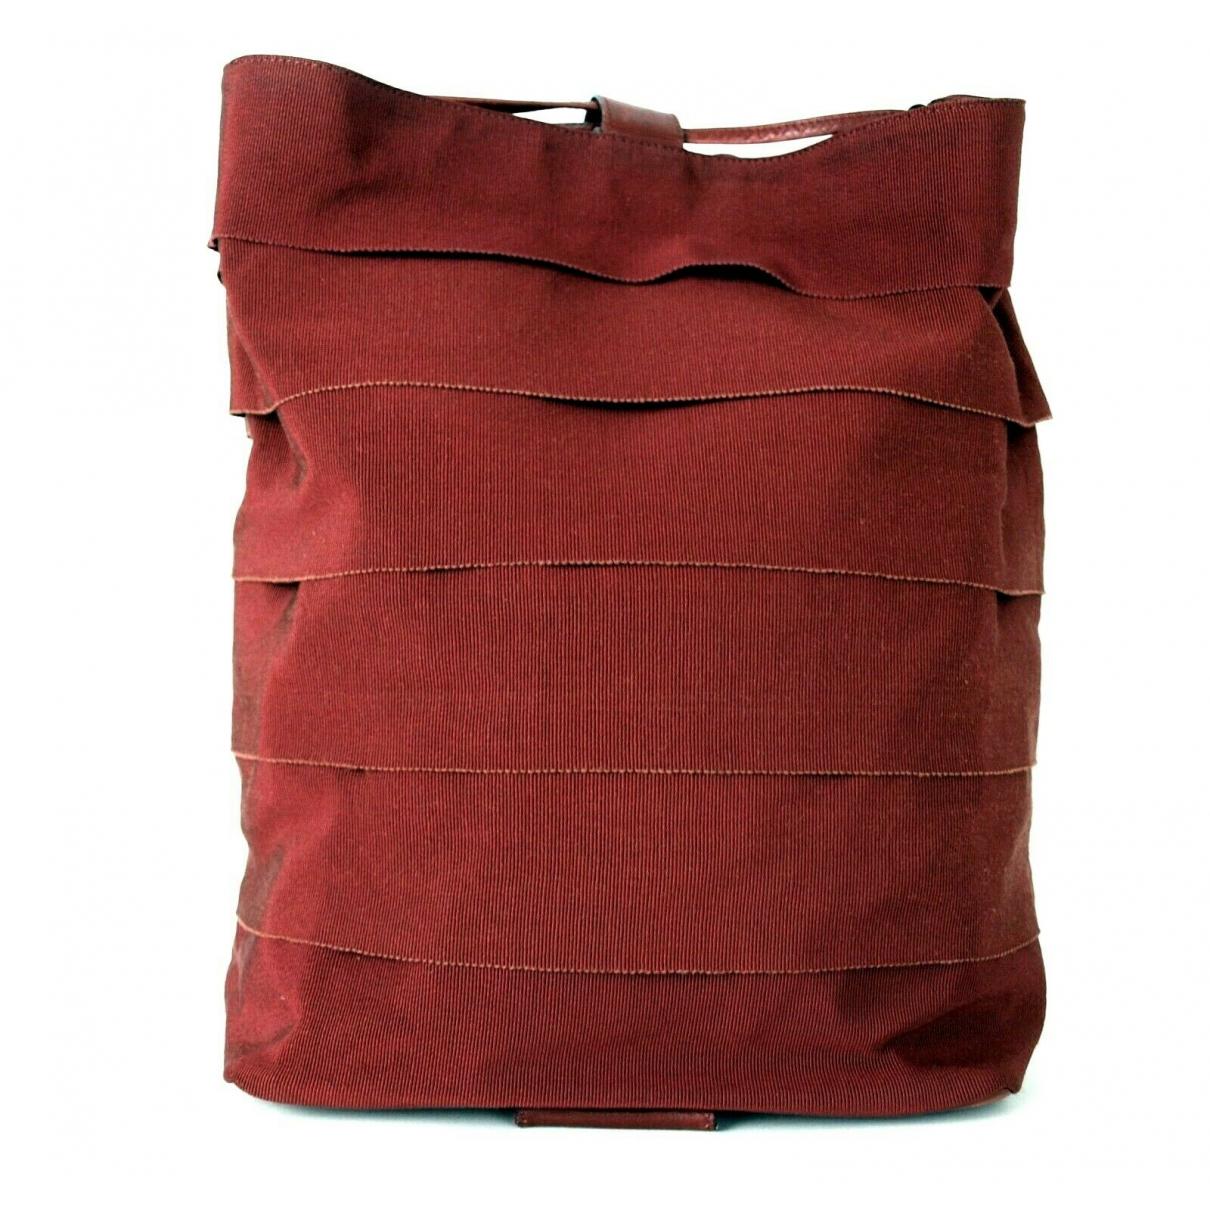 Salvatore Ferragamo \N Handtasche in  Rot Leder